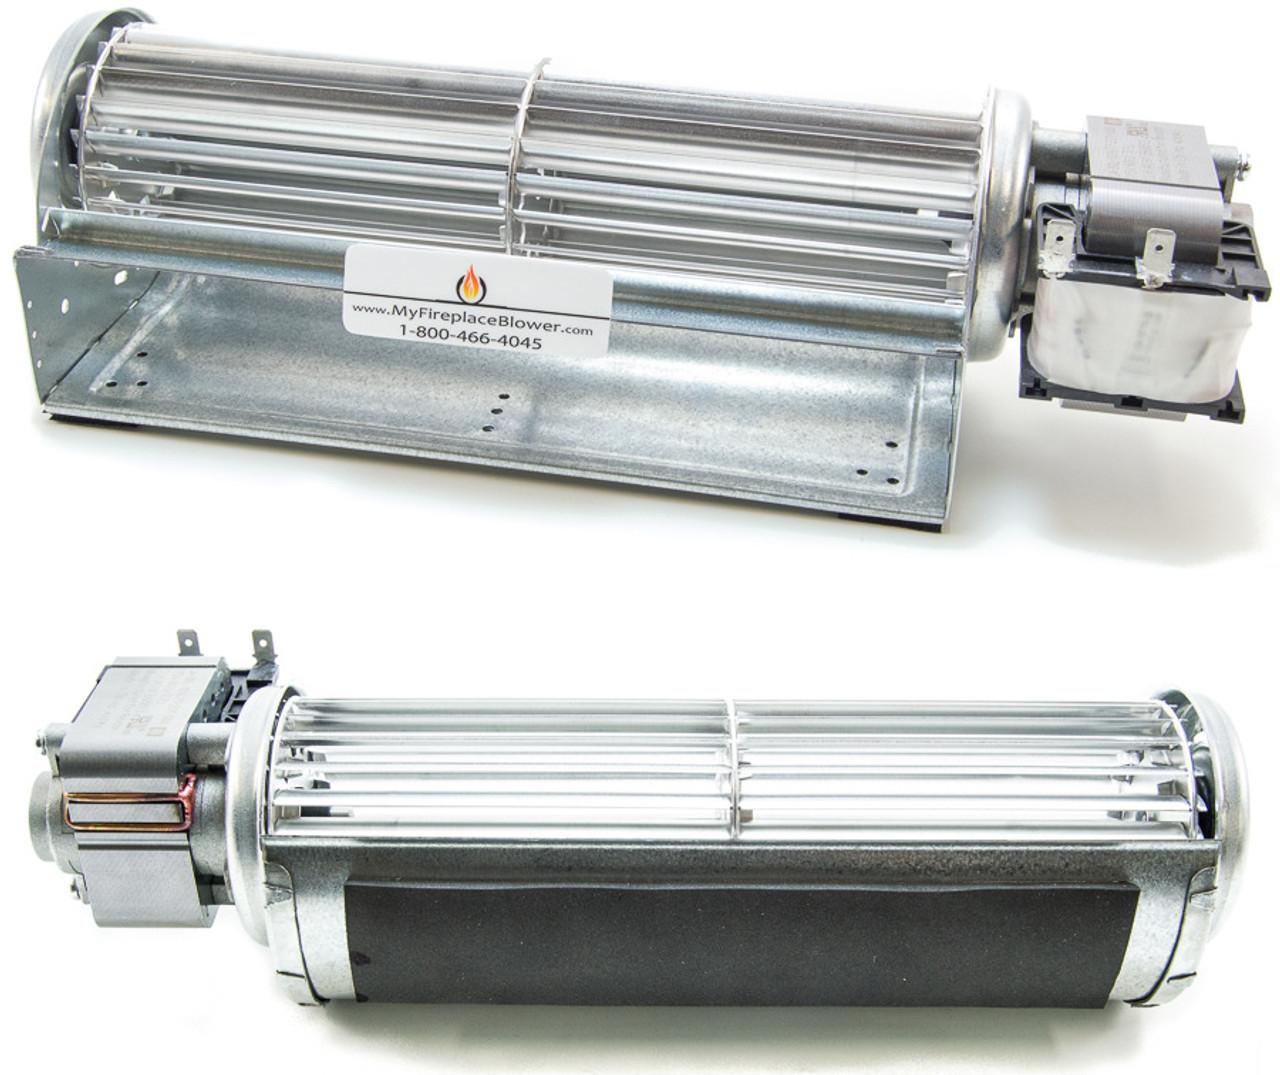 small resolution of  gfk4b fireplace blower motor for heatilator ndv3933 ndv3933i fireplaces